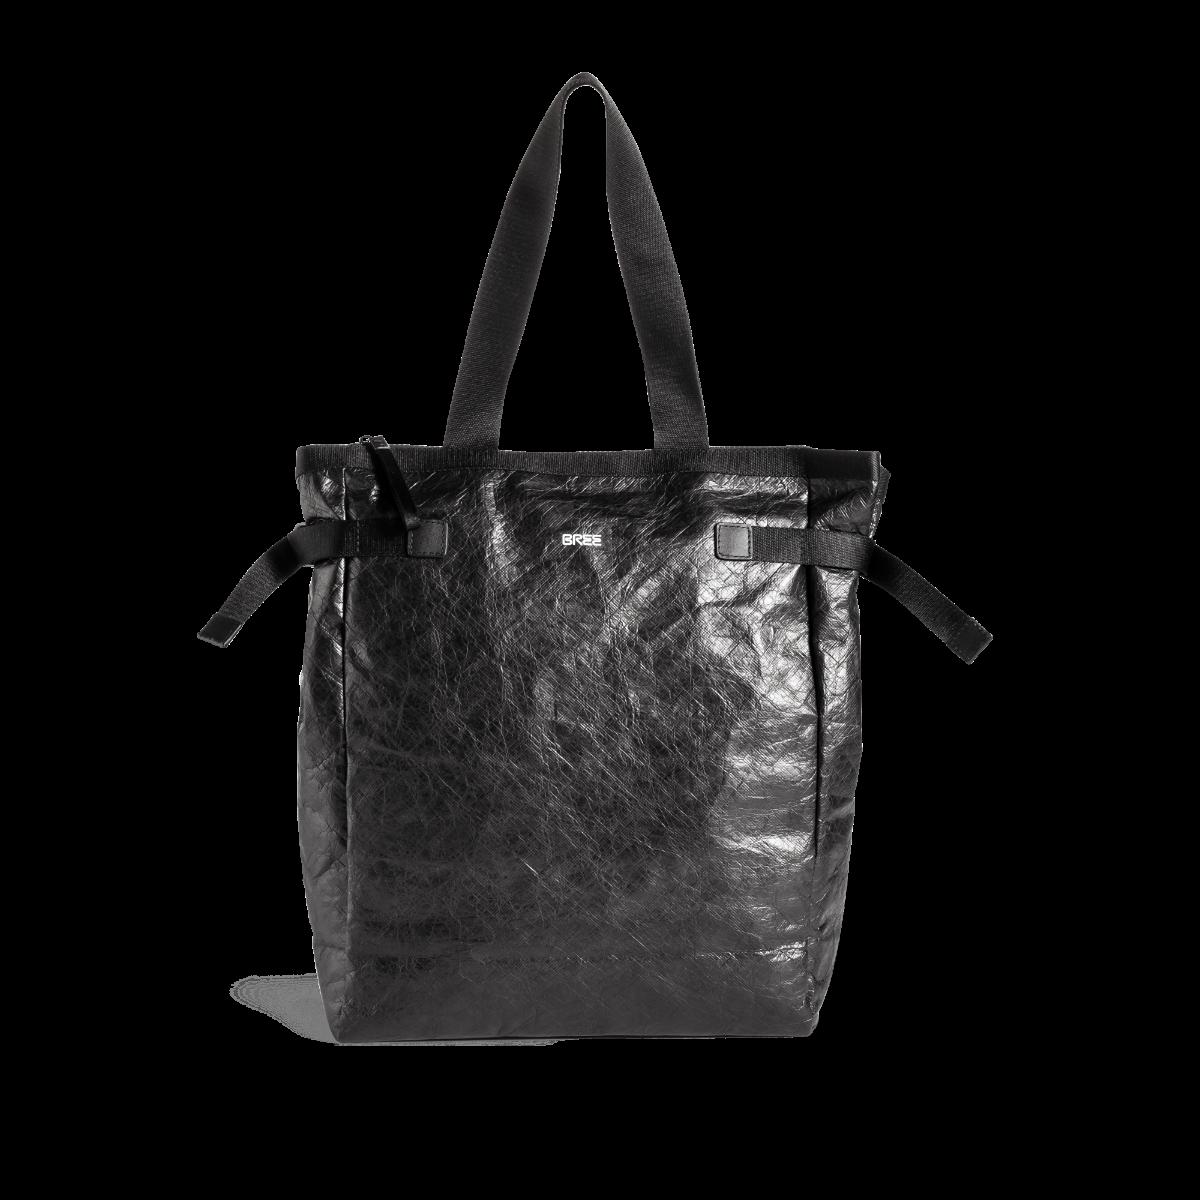 PNCH Vary 6 - Black - Belt Bag